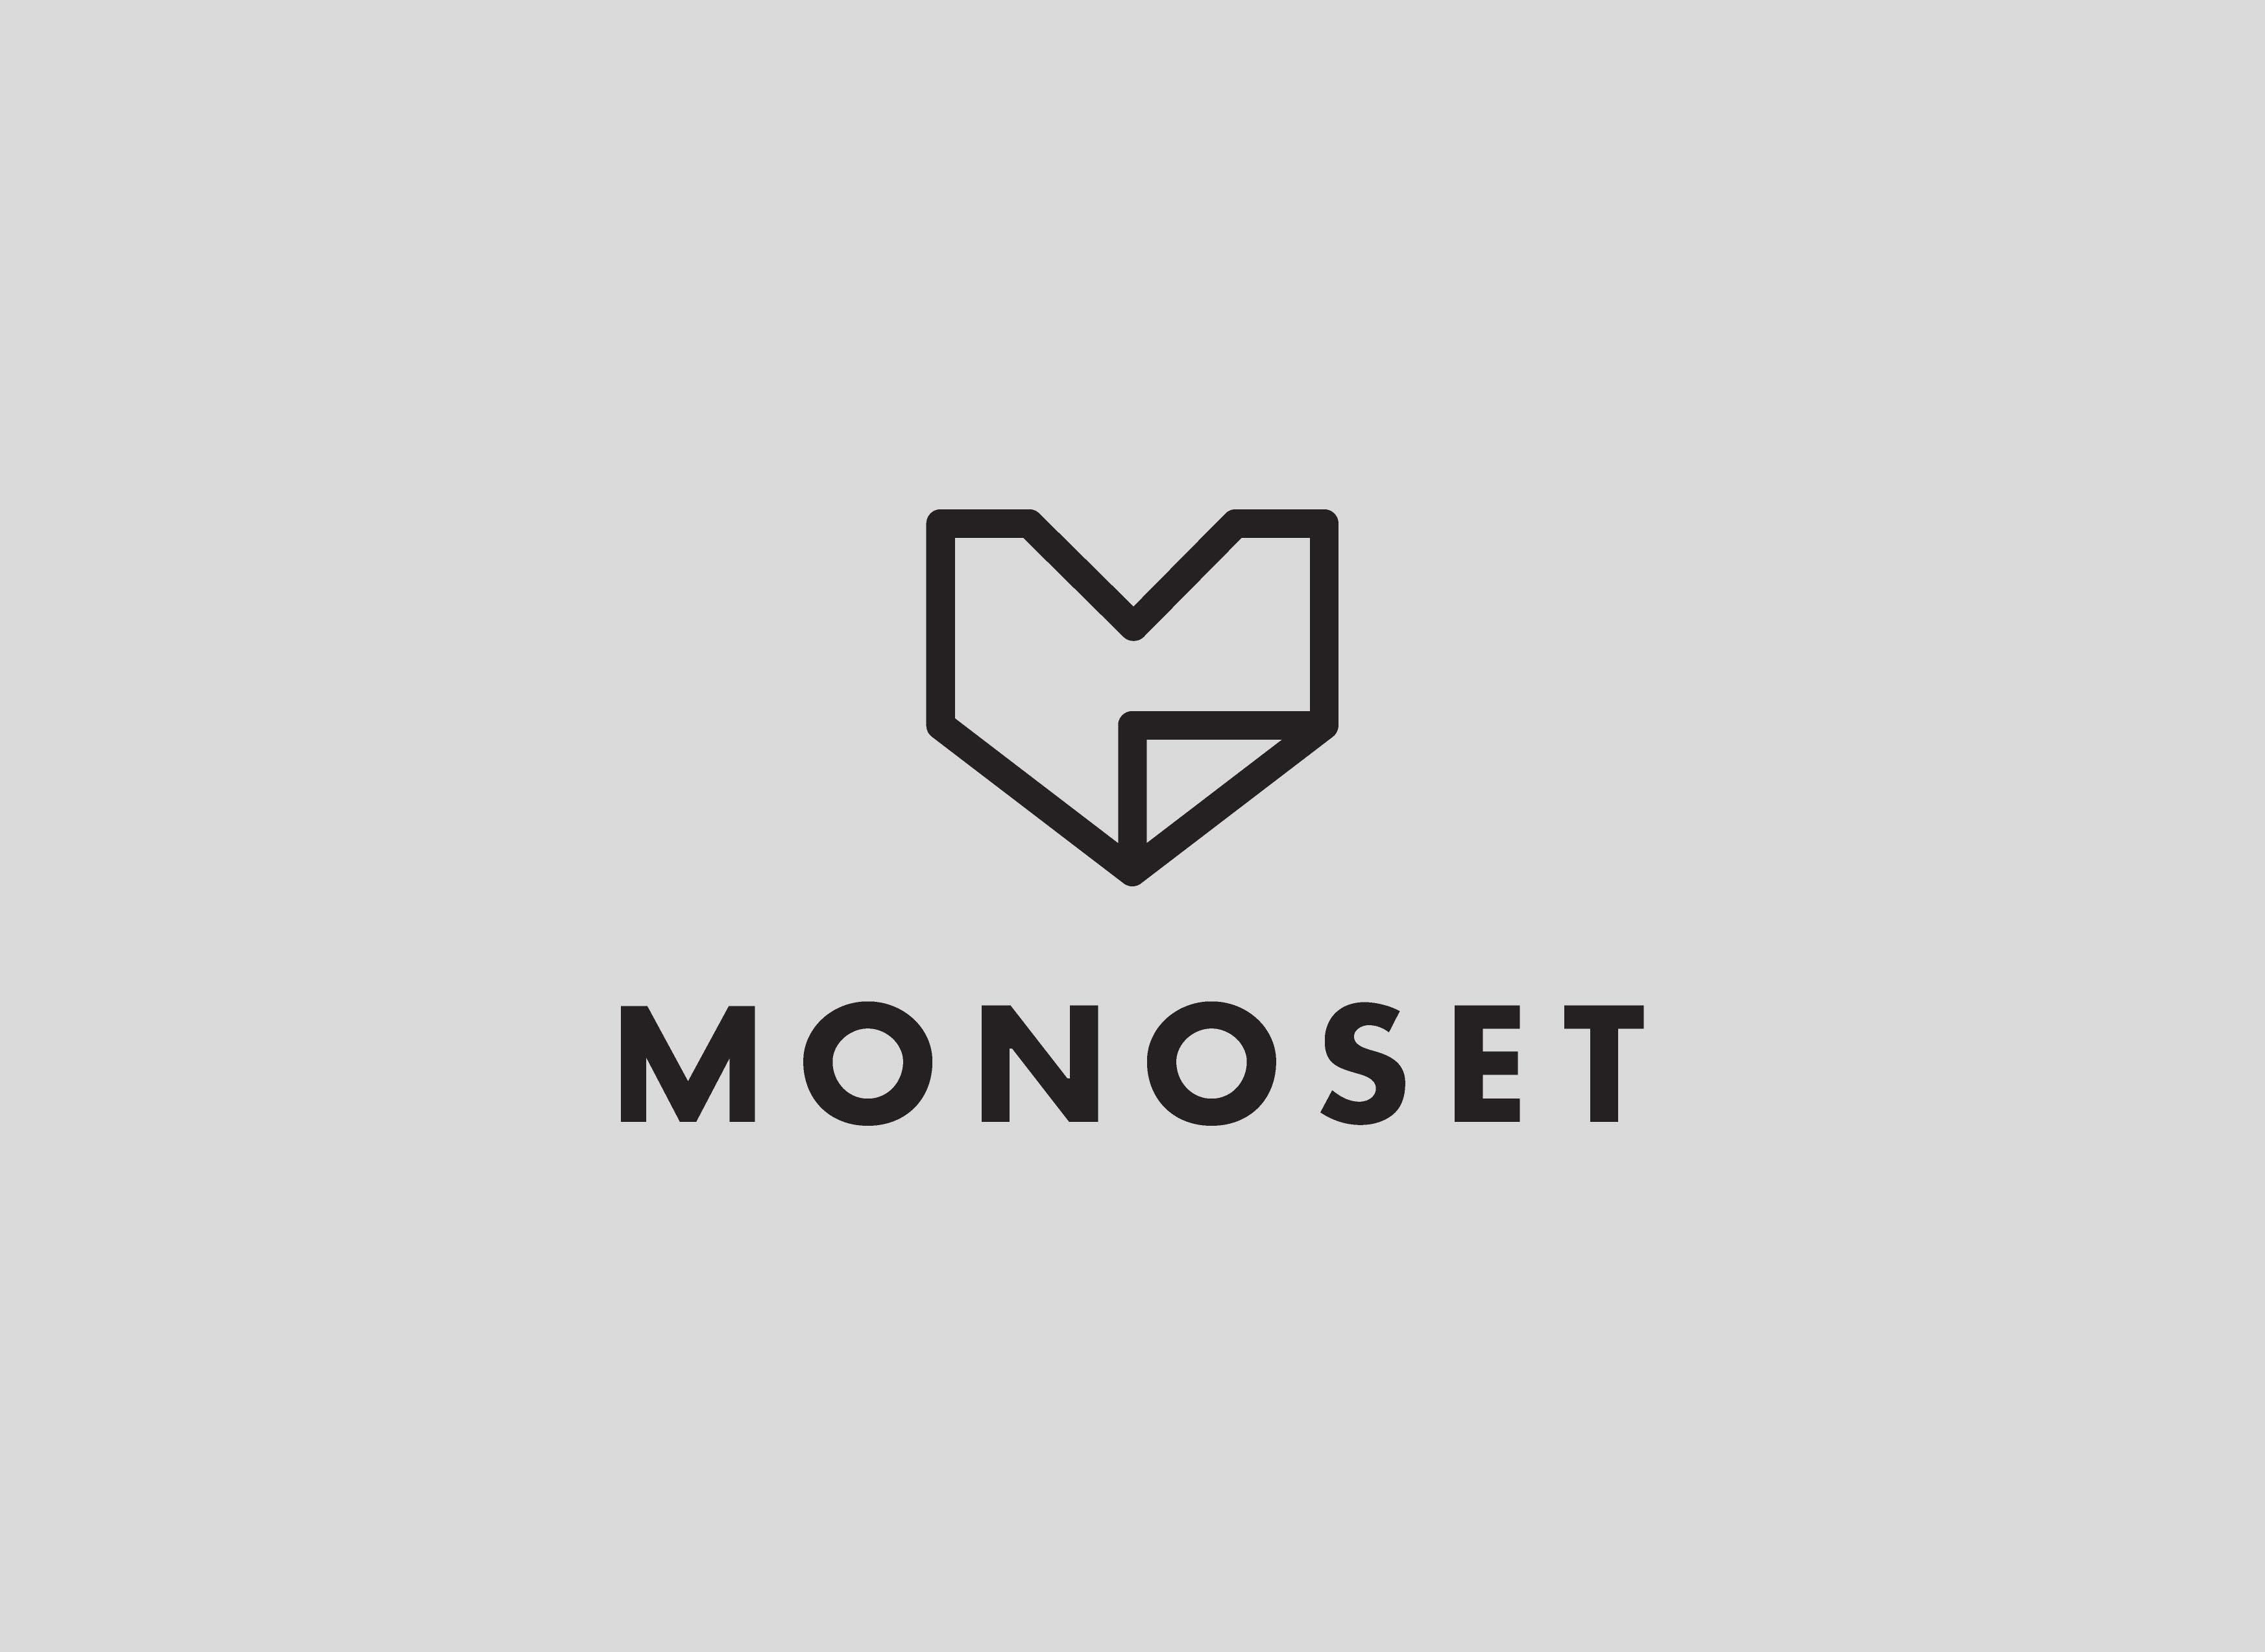 Cover image: Monoset Brand Identity